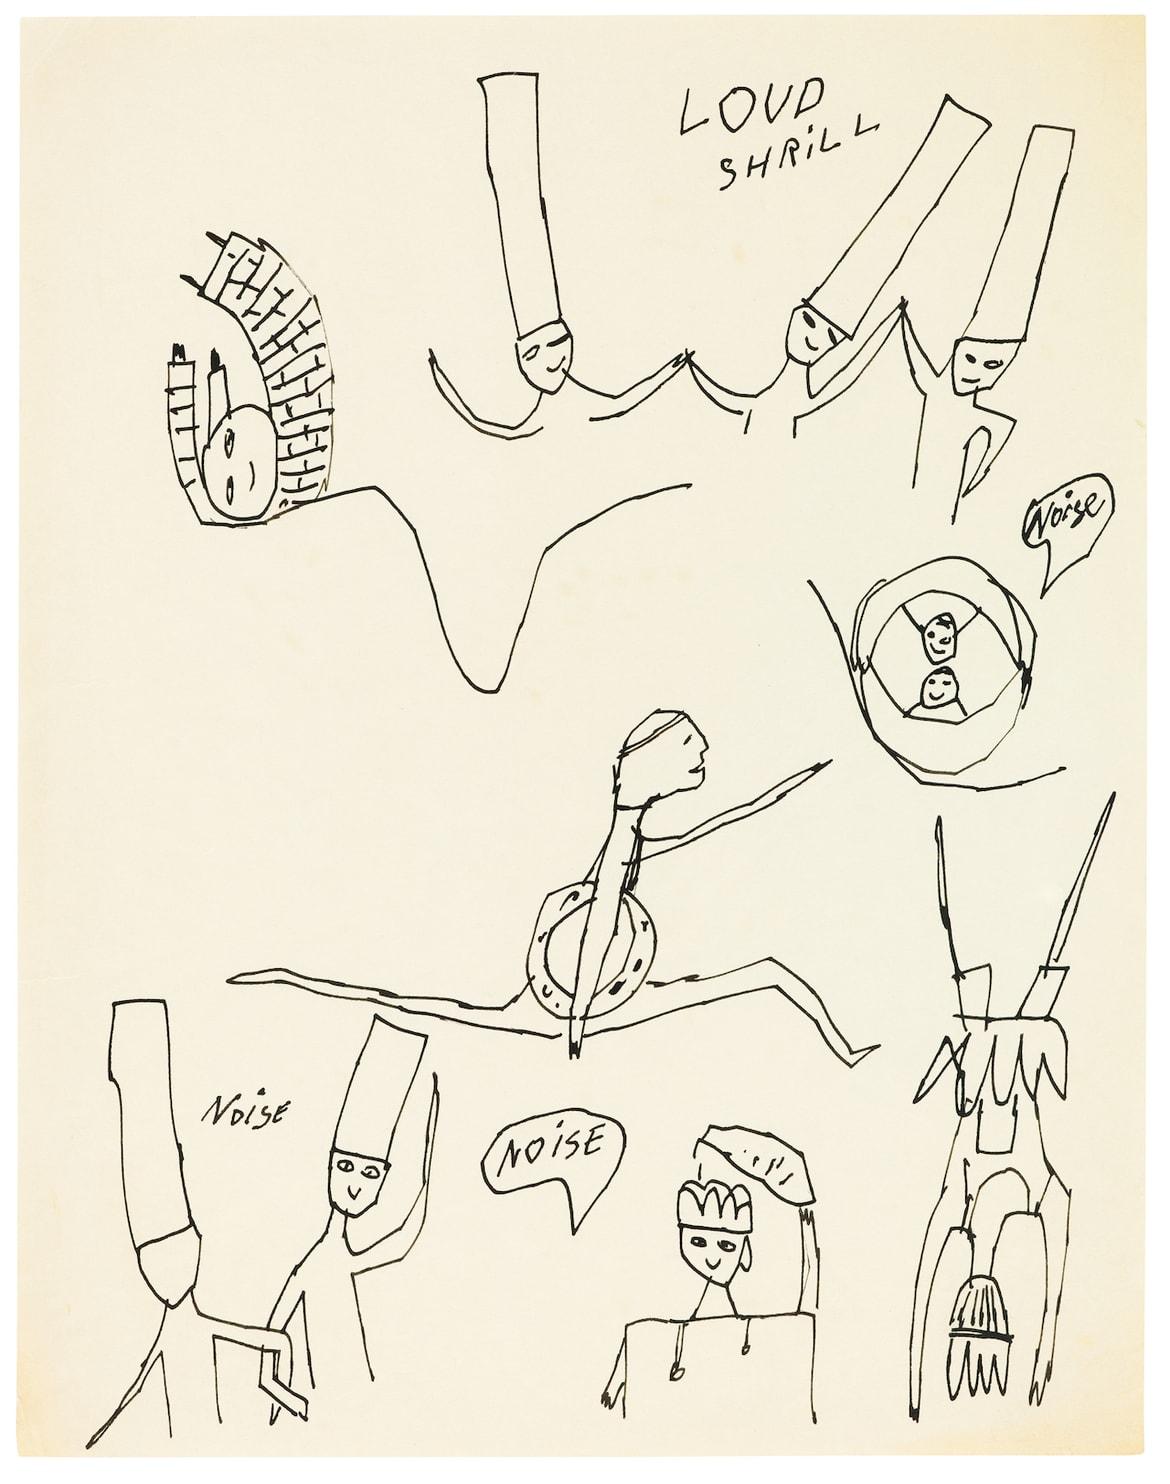 dance diagram andy warhol andy warhol early drawings   galerie bucholz hypebeast  andy warhol early drawings   galerie